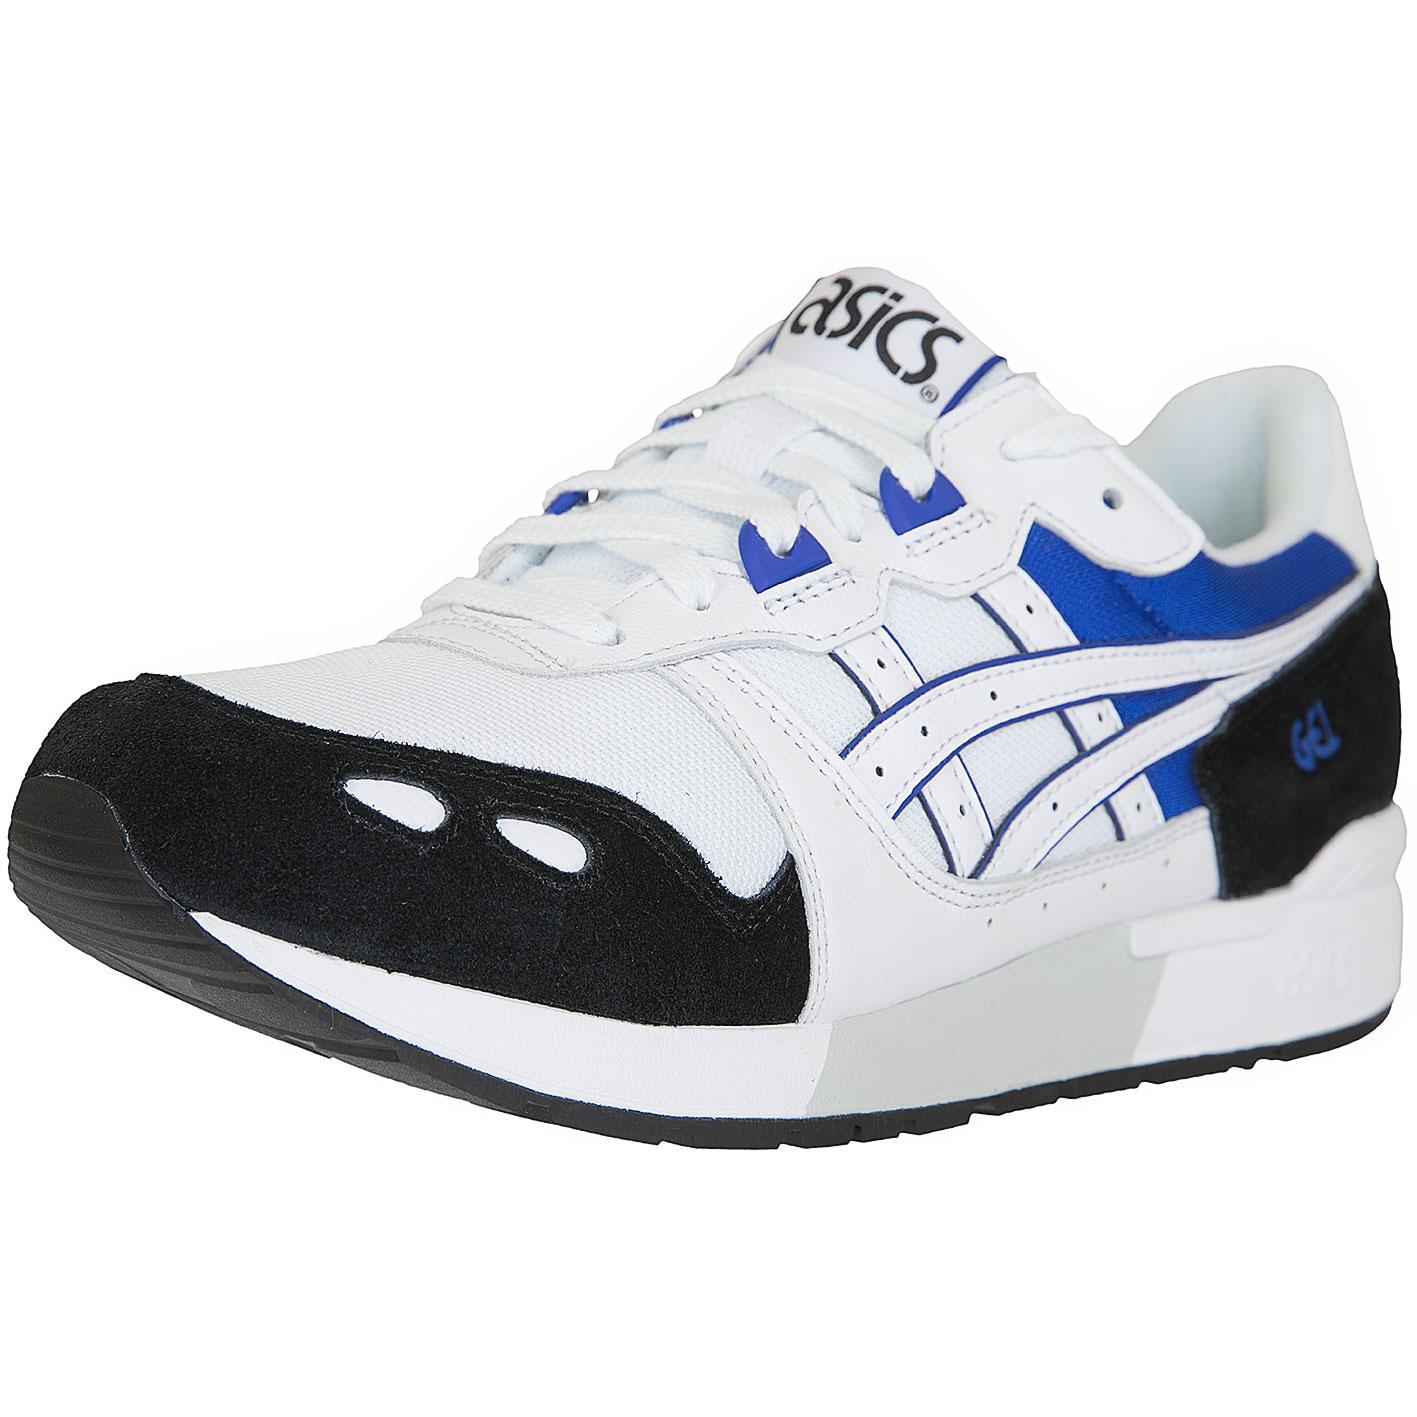 lowest price 89fc2 6b4b2 Asics Sneaker Gel-Lyte weiß/blau